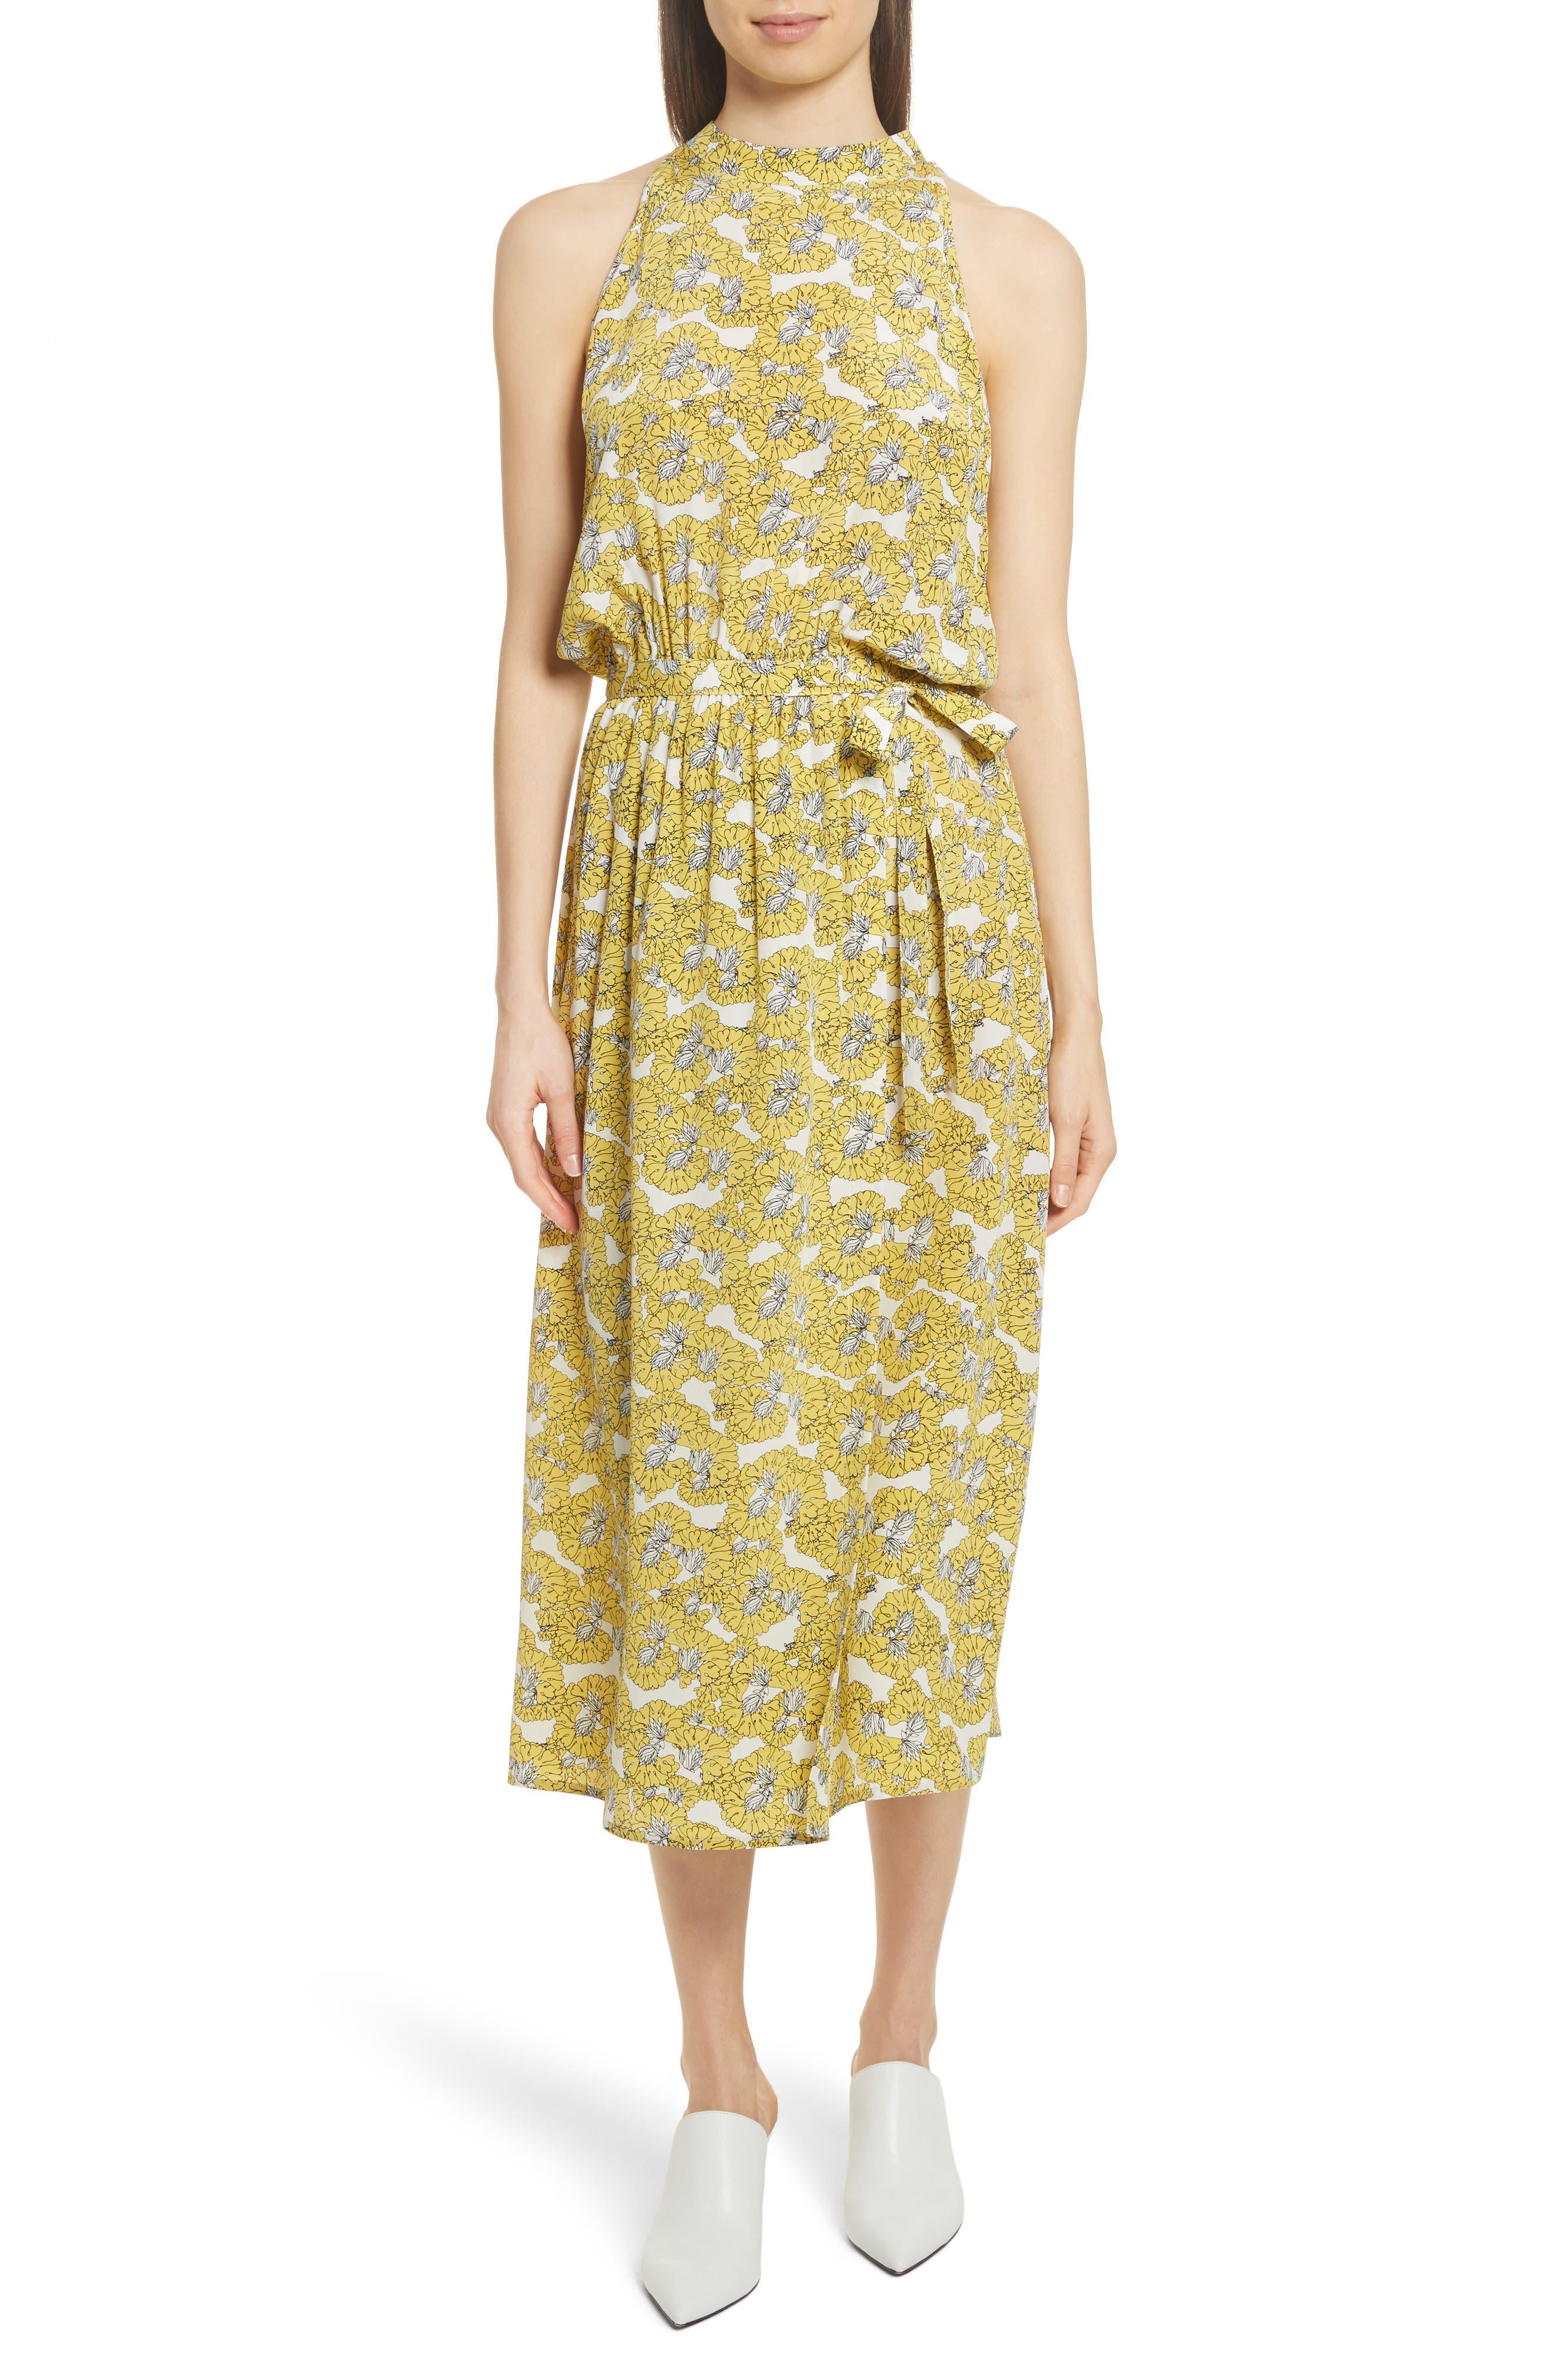 Dania Floral Print Dress,                         Main,                         color, Yellow Floral